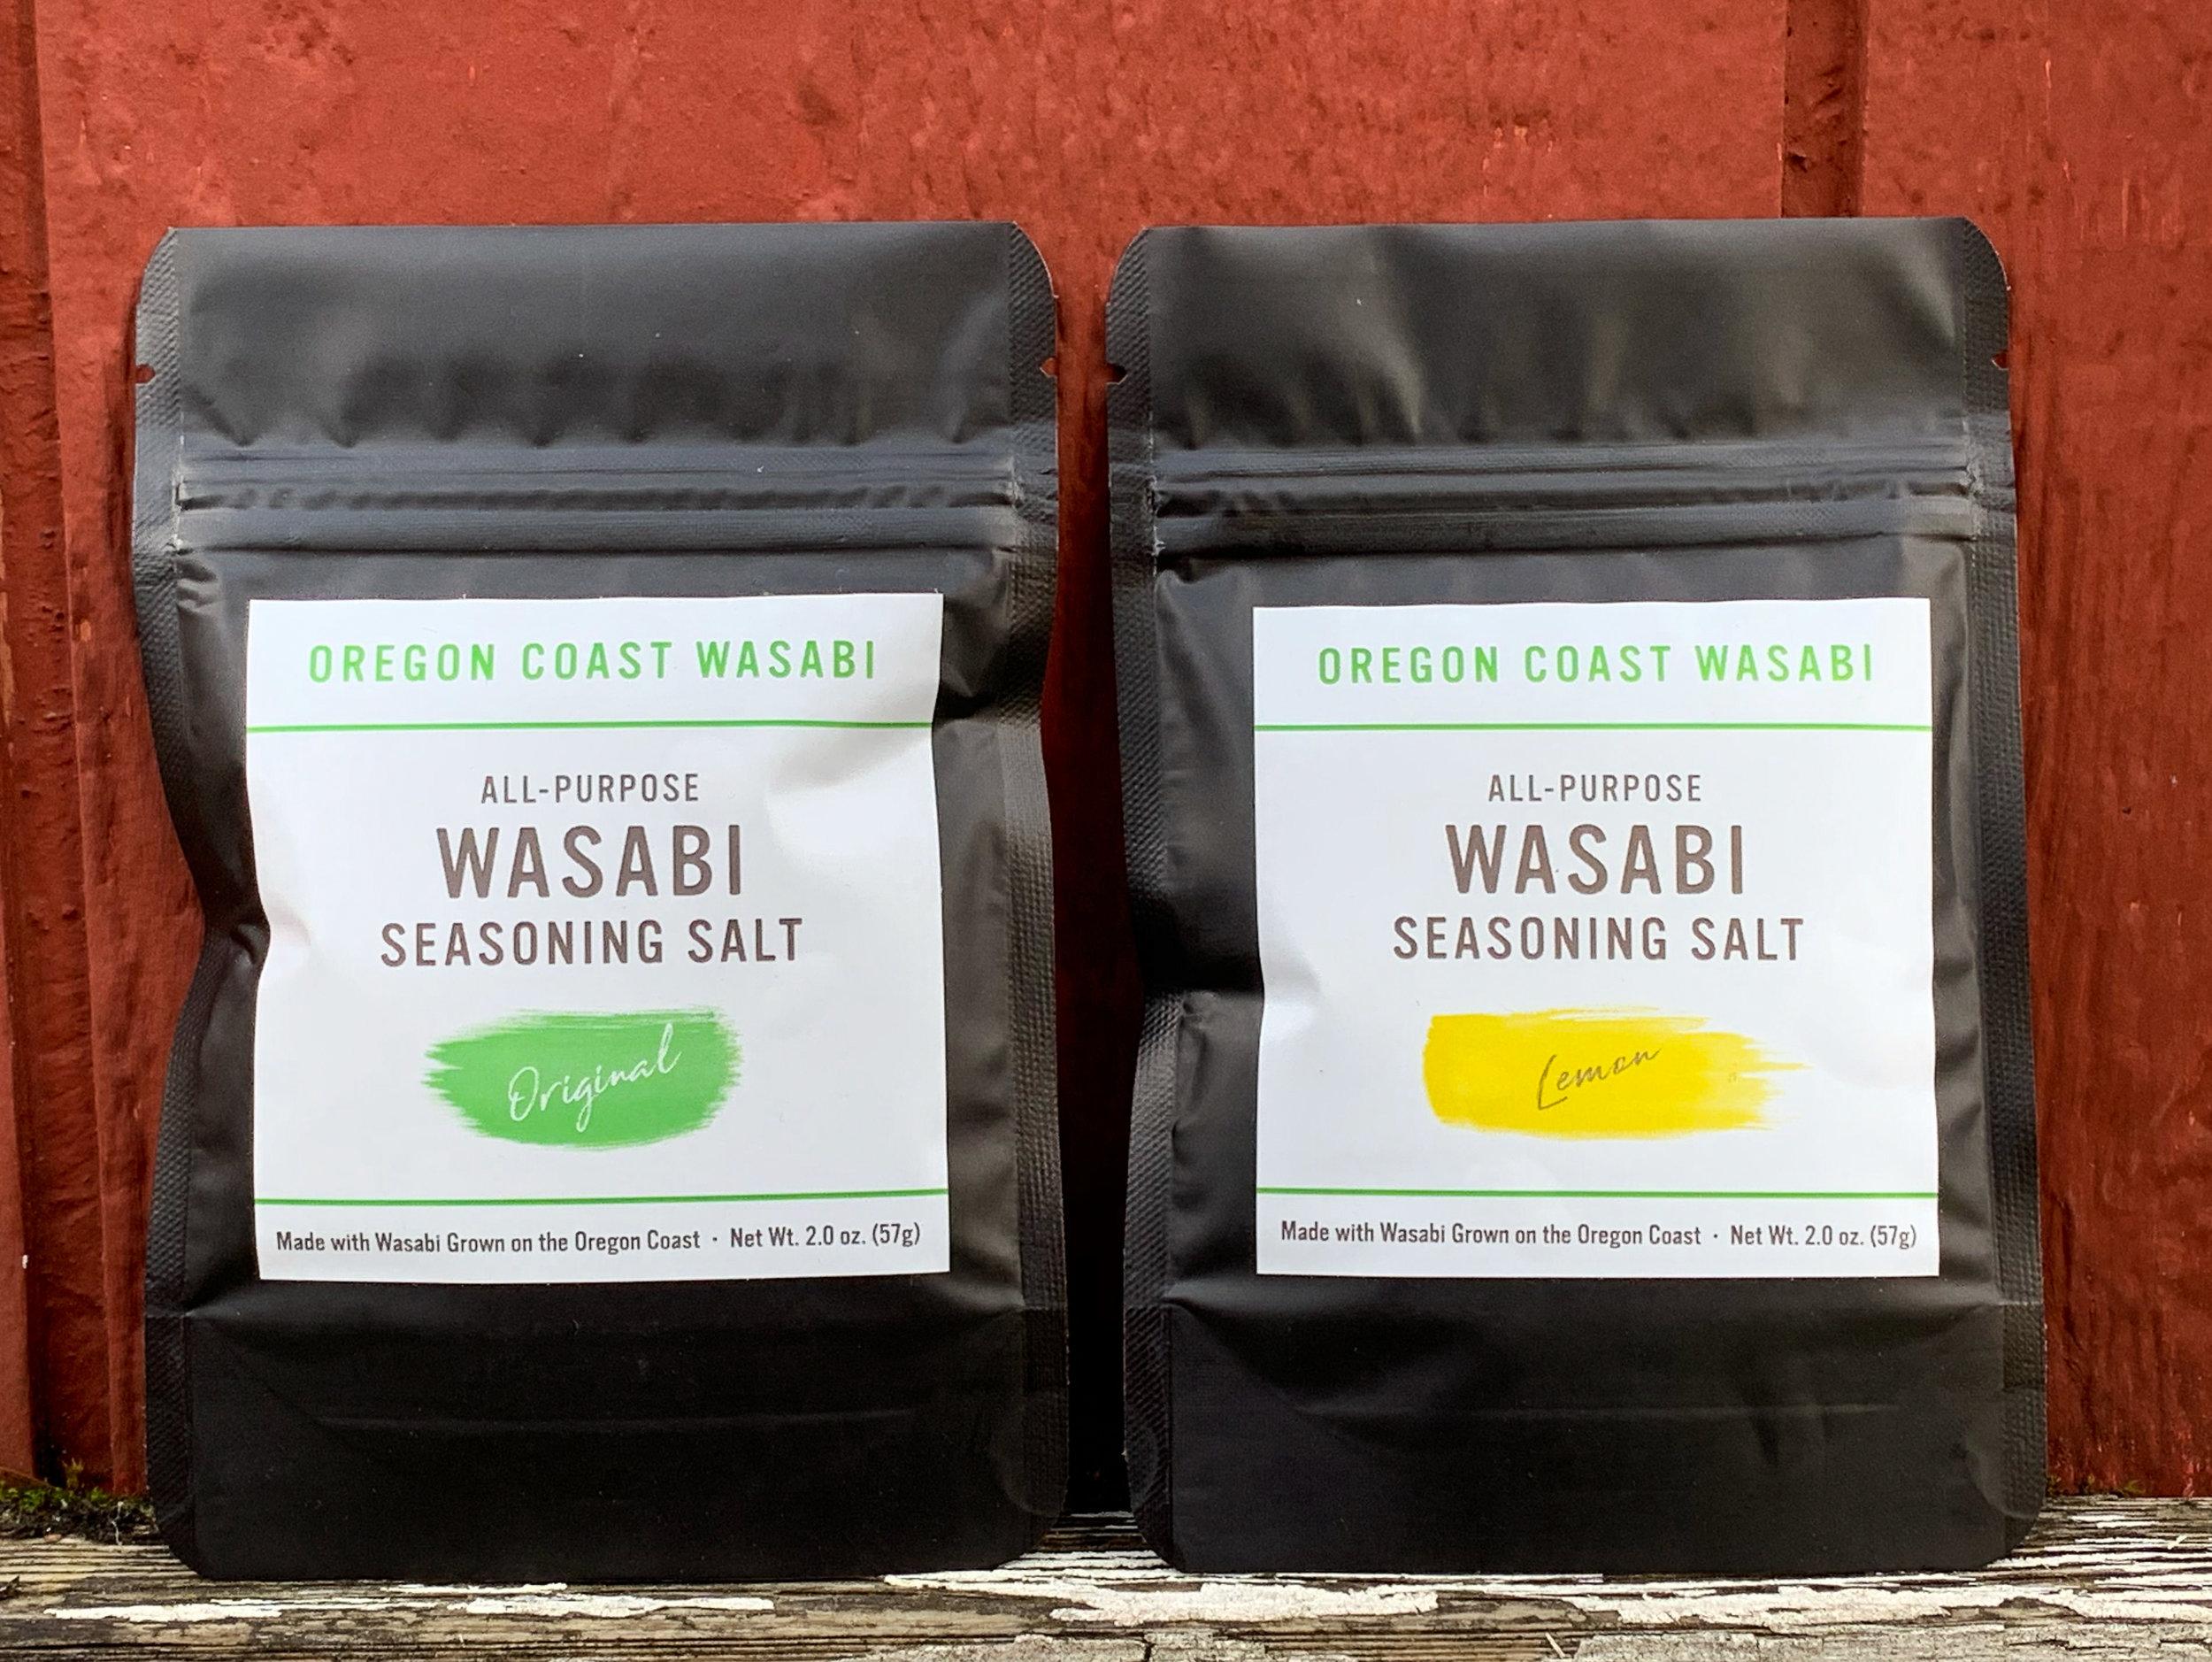 Oregon Coast Wasabi All-Purpose Wasabi Seasoning Salt-100.jpg